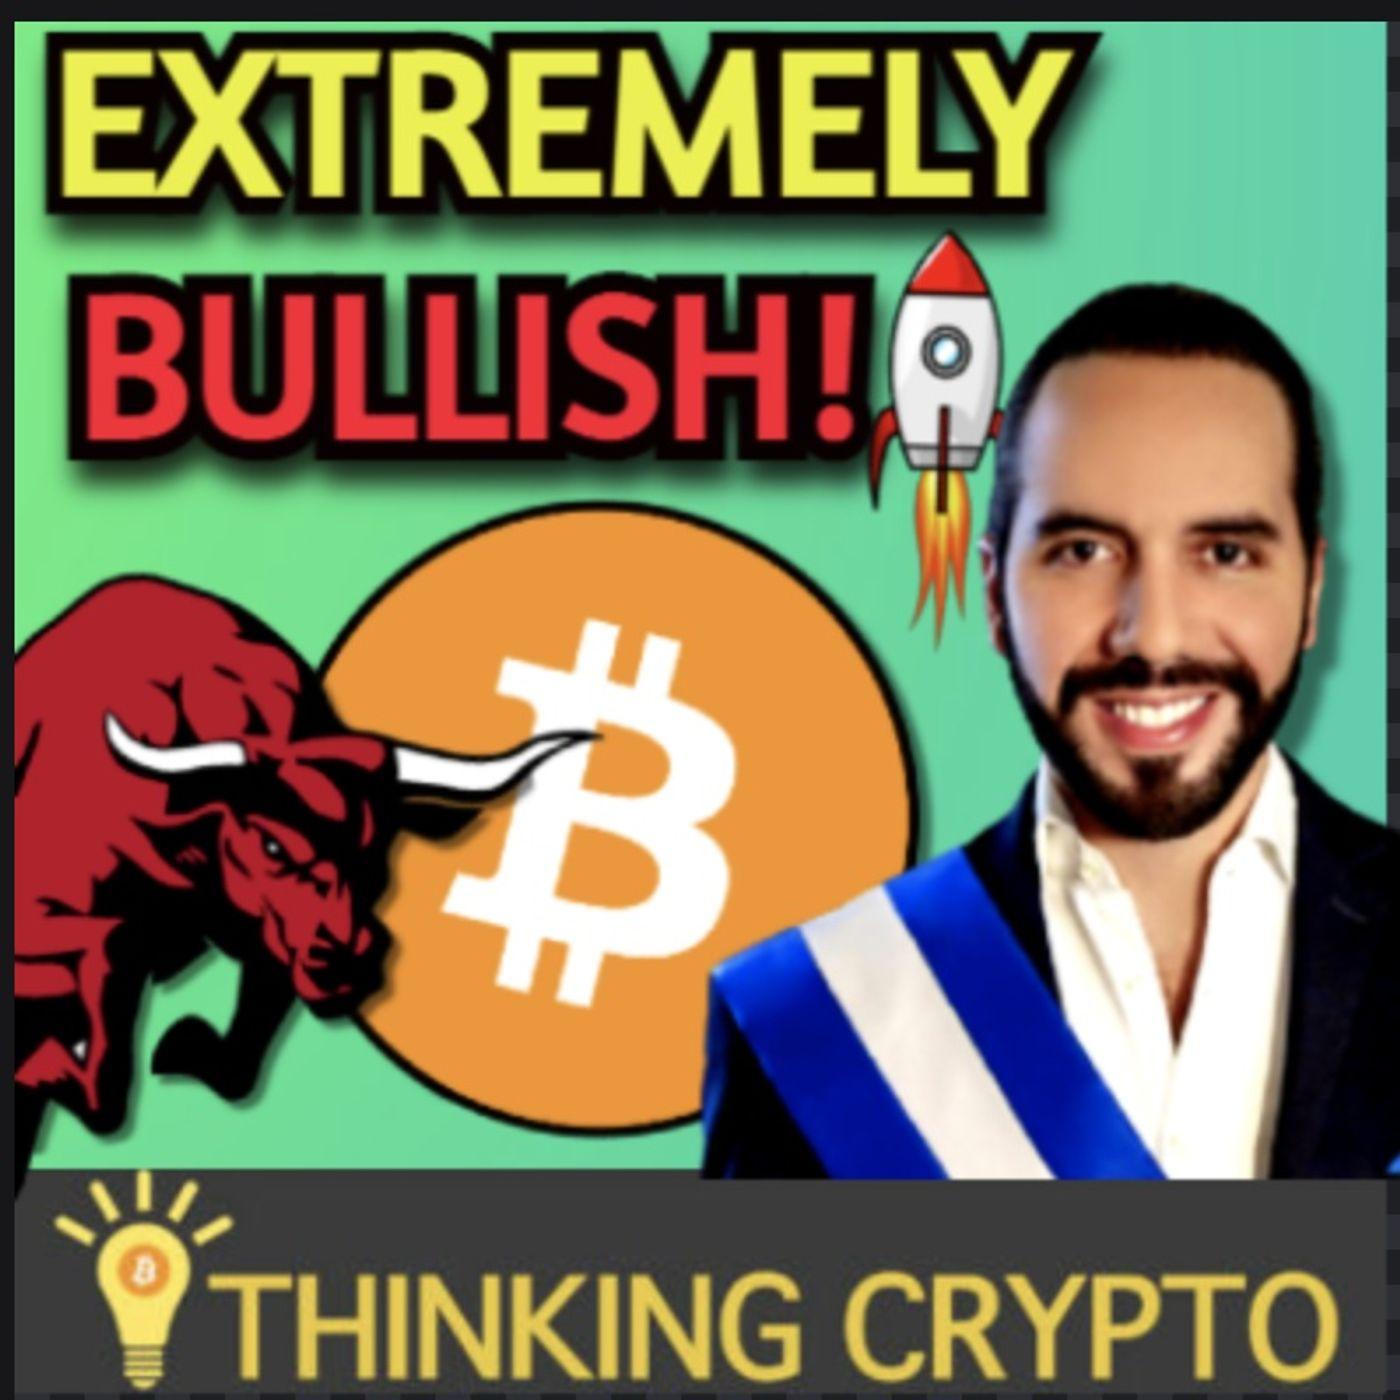 El Salvador Makes BITCOIN A Legal Tender - Invesco Crypto ETFs - Ripple CEO Jay Clayton